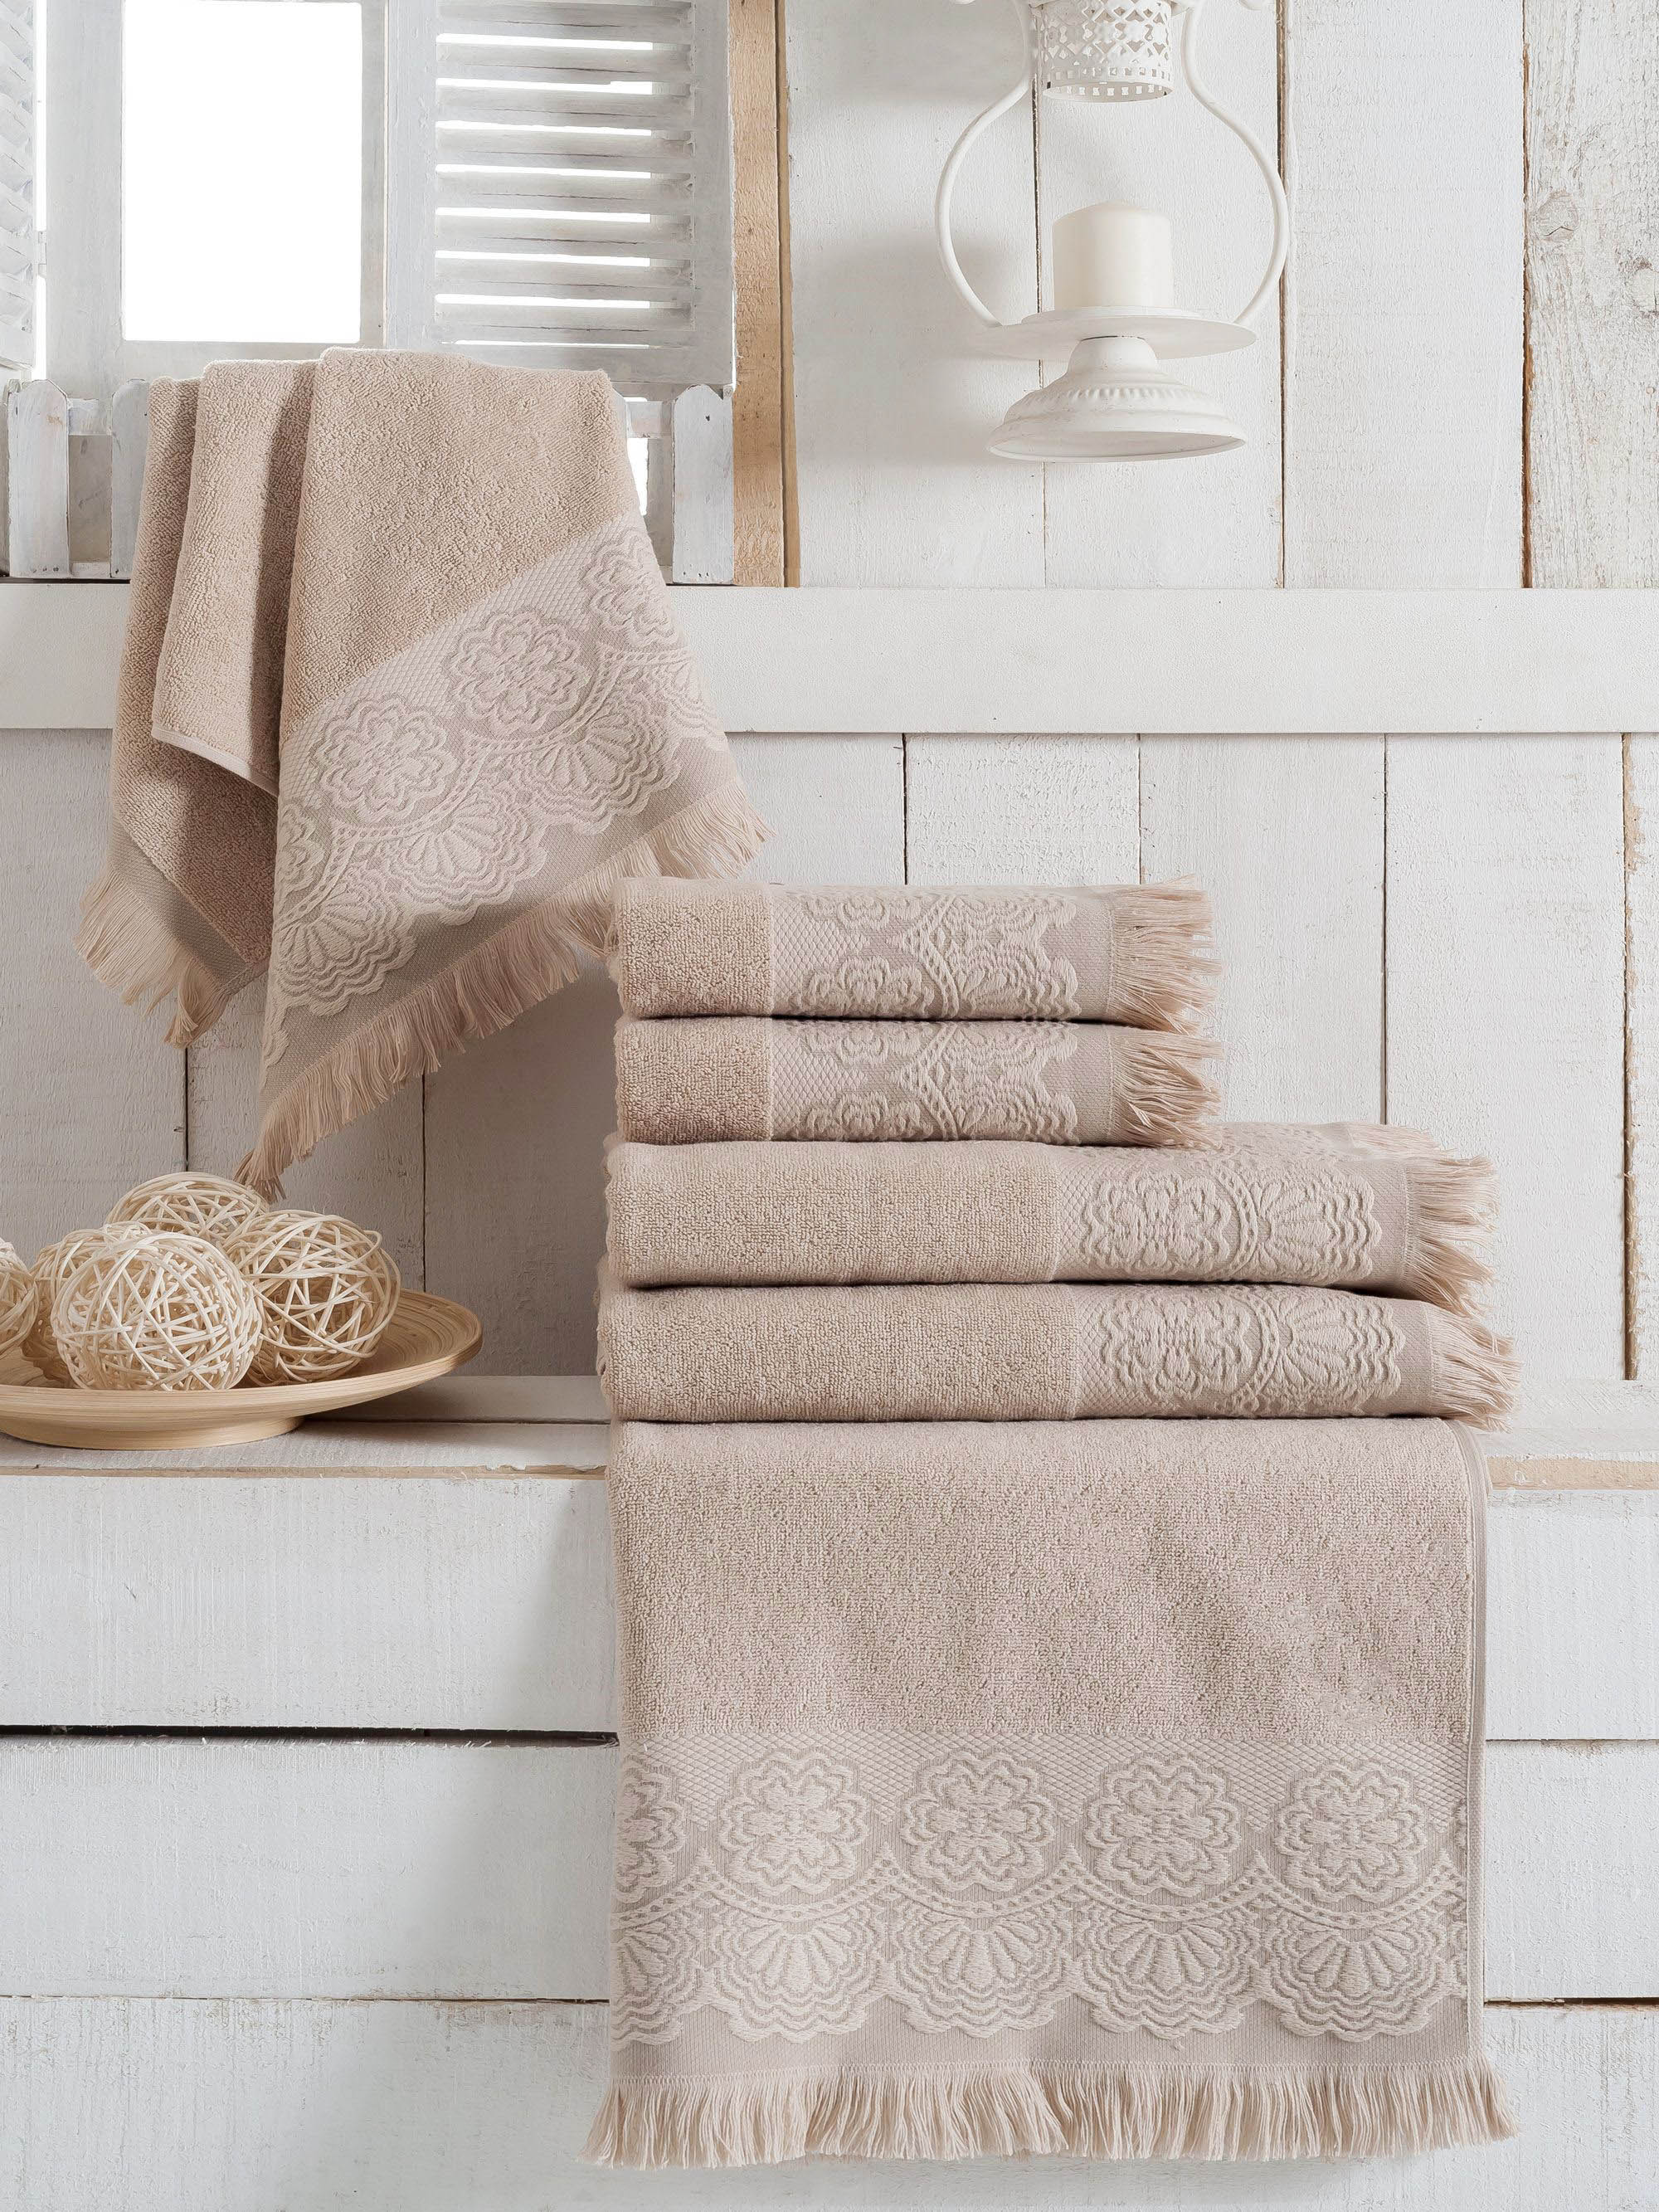 Полотенца Sokuculer Полотенце Zara Цвет: Молочный (50х90 см - 3 шт) полотенца банные spasilk полотенце 3 шт